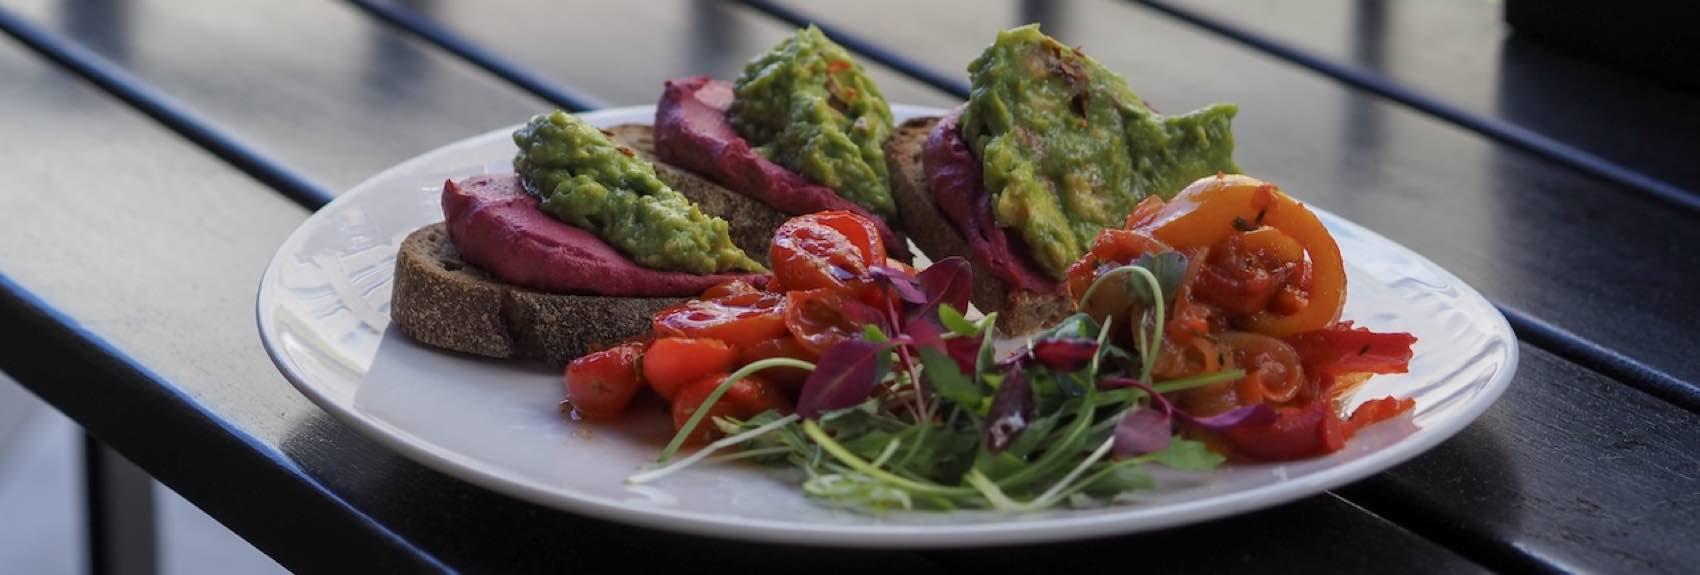 Vegan Restaurants in London